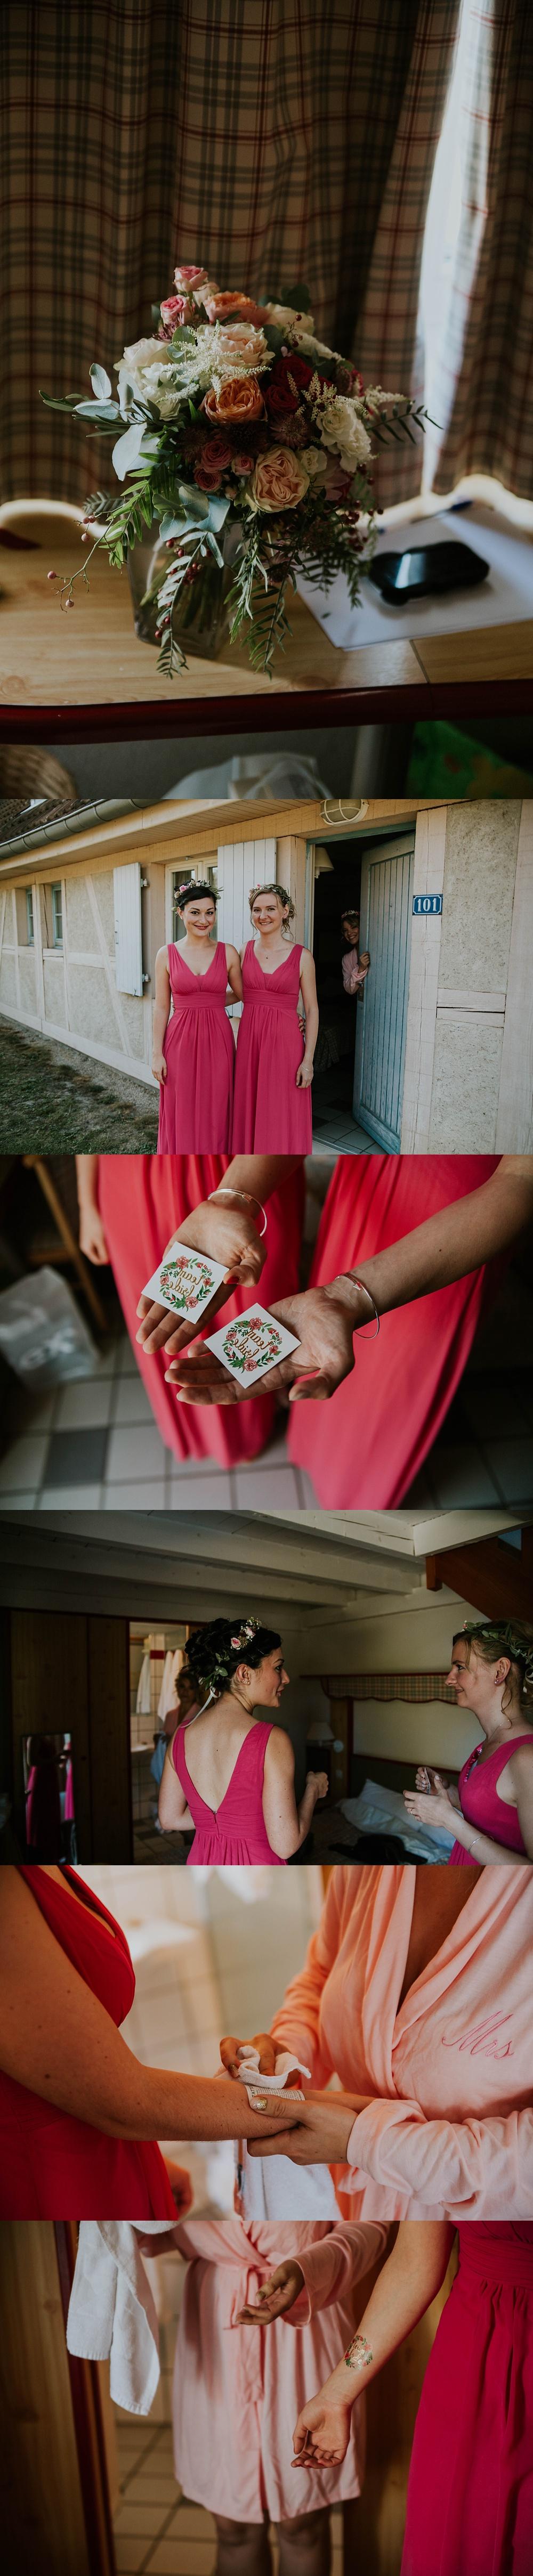 Mariage Ecomusée Alsace photographe